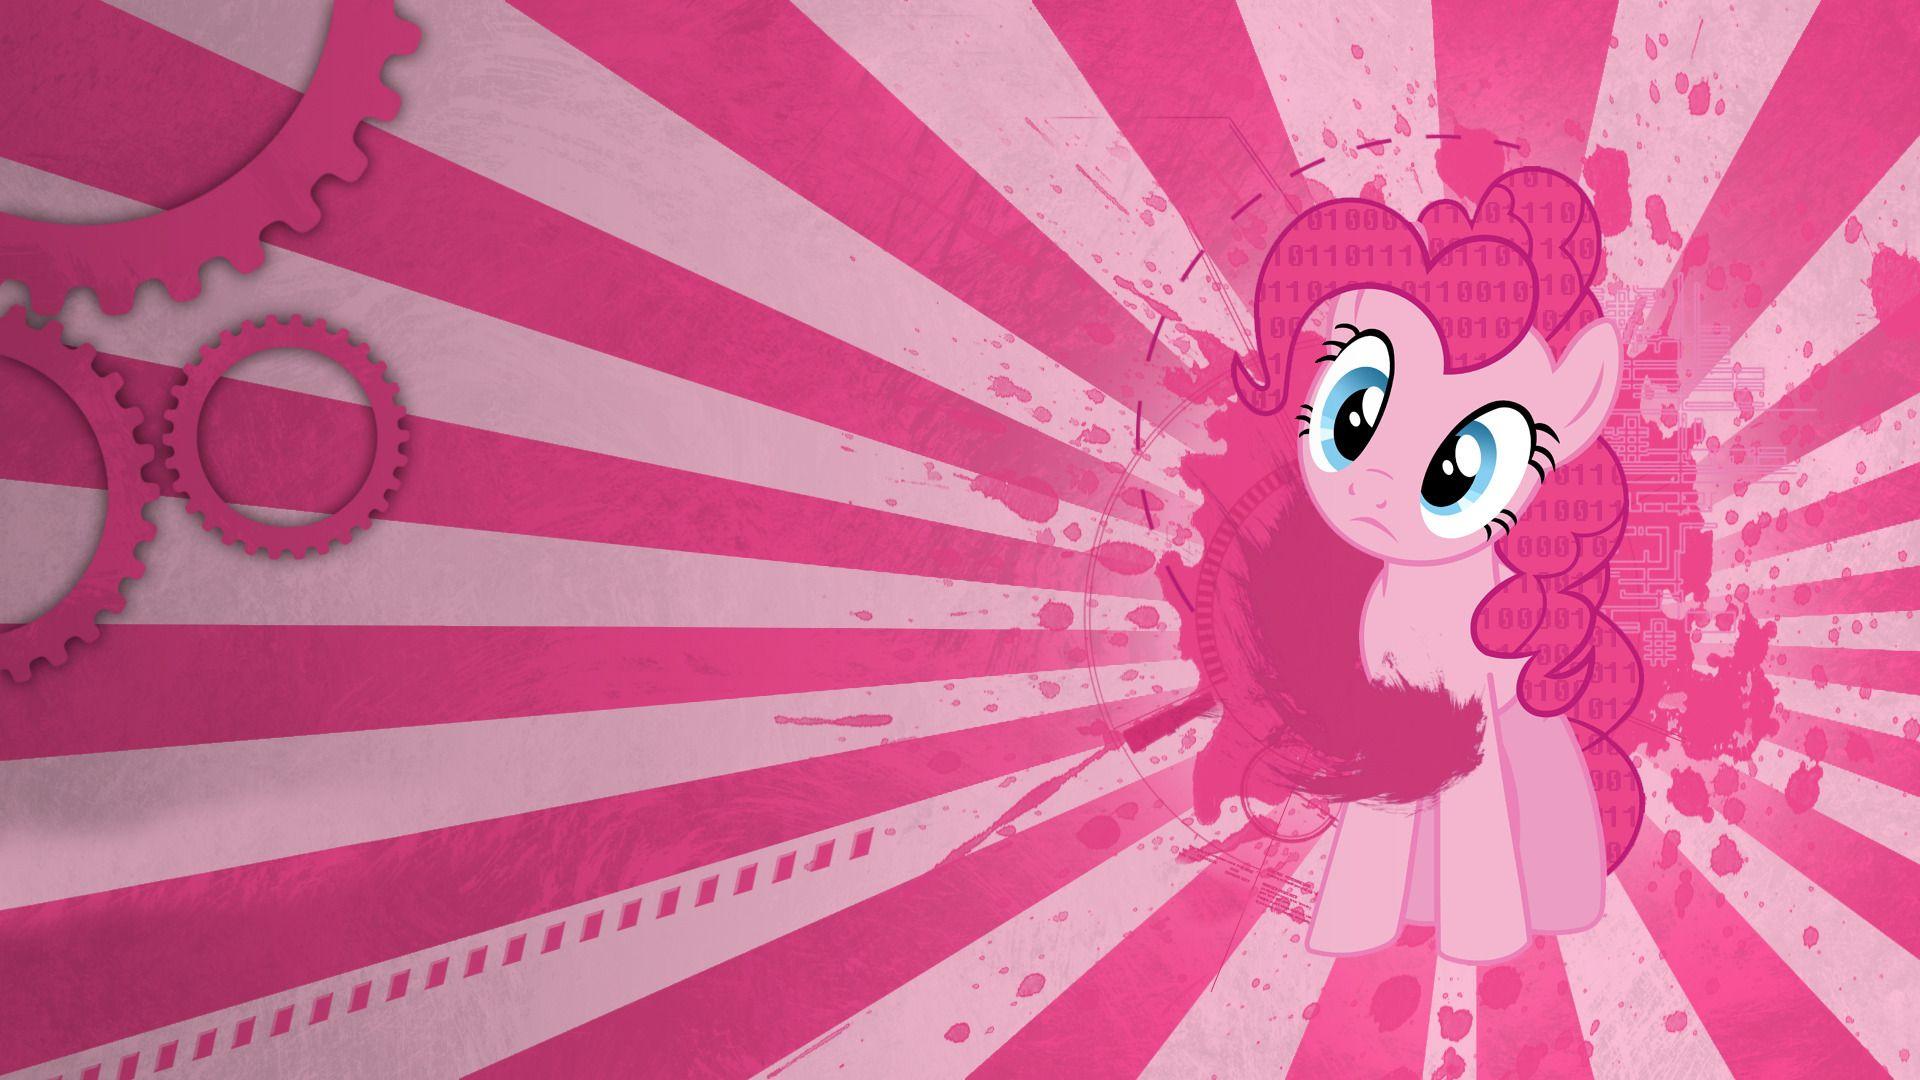 Pinkie Pie Pinkie Pie Wallpaper 1920x1080 Pinkie Pie My